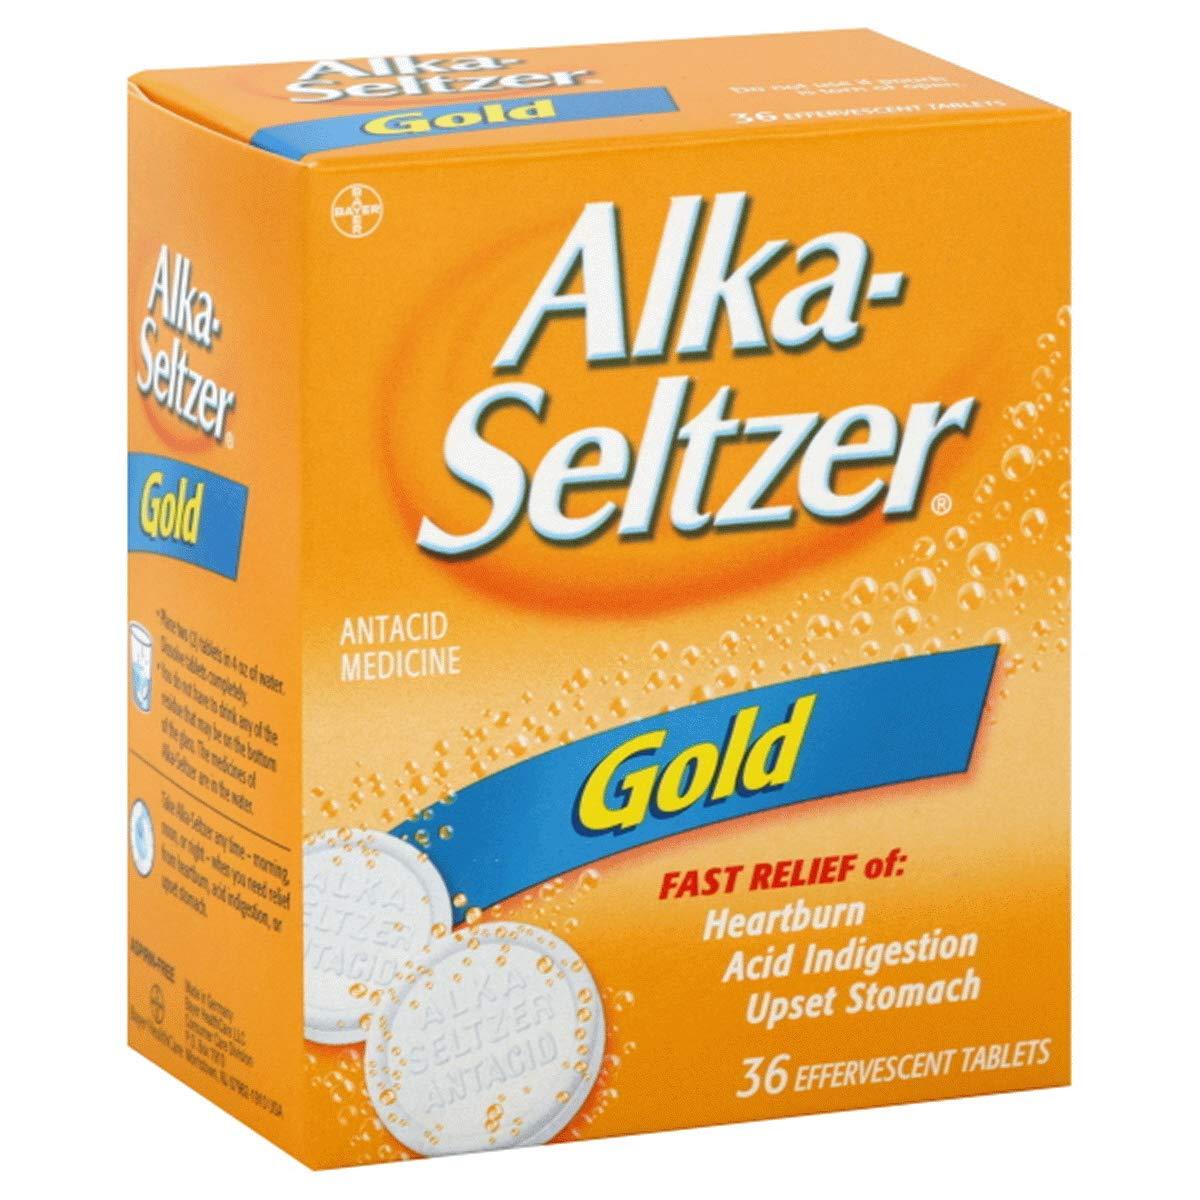 Alka-Seltzer Effervescent Gold - 36 Tablets, Pack of 3 by Alka-Seltzer